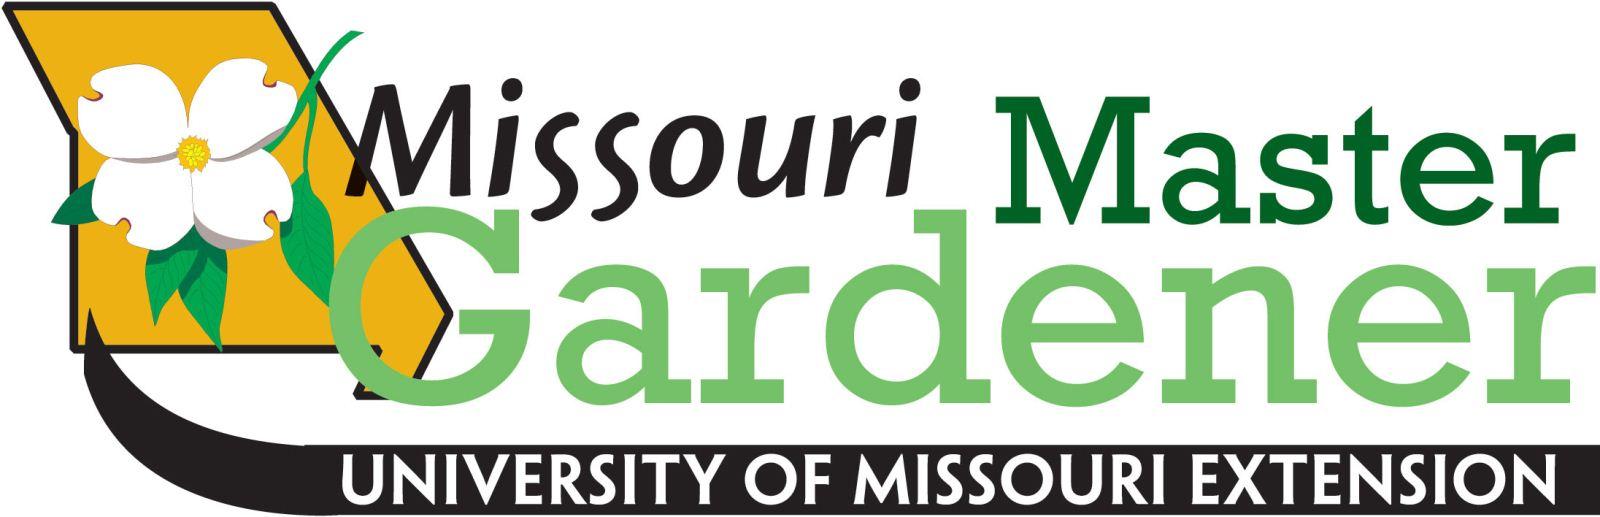 University of Missouri Extension Master Gardener Program